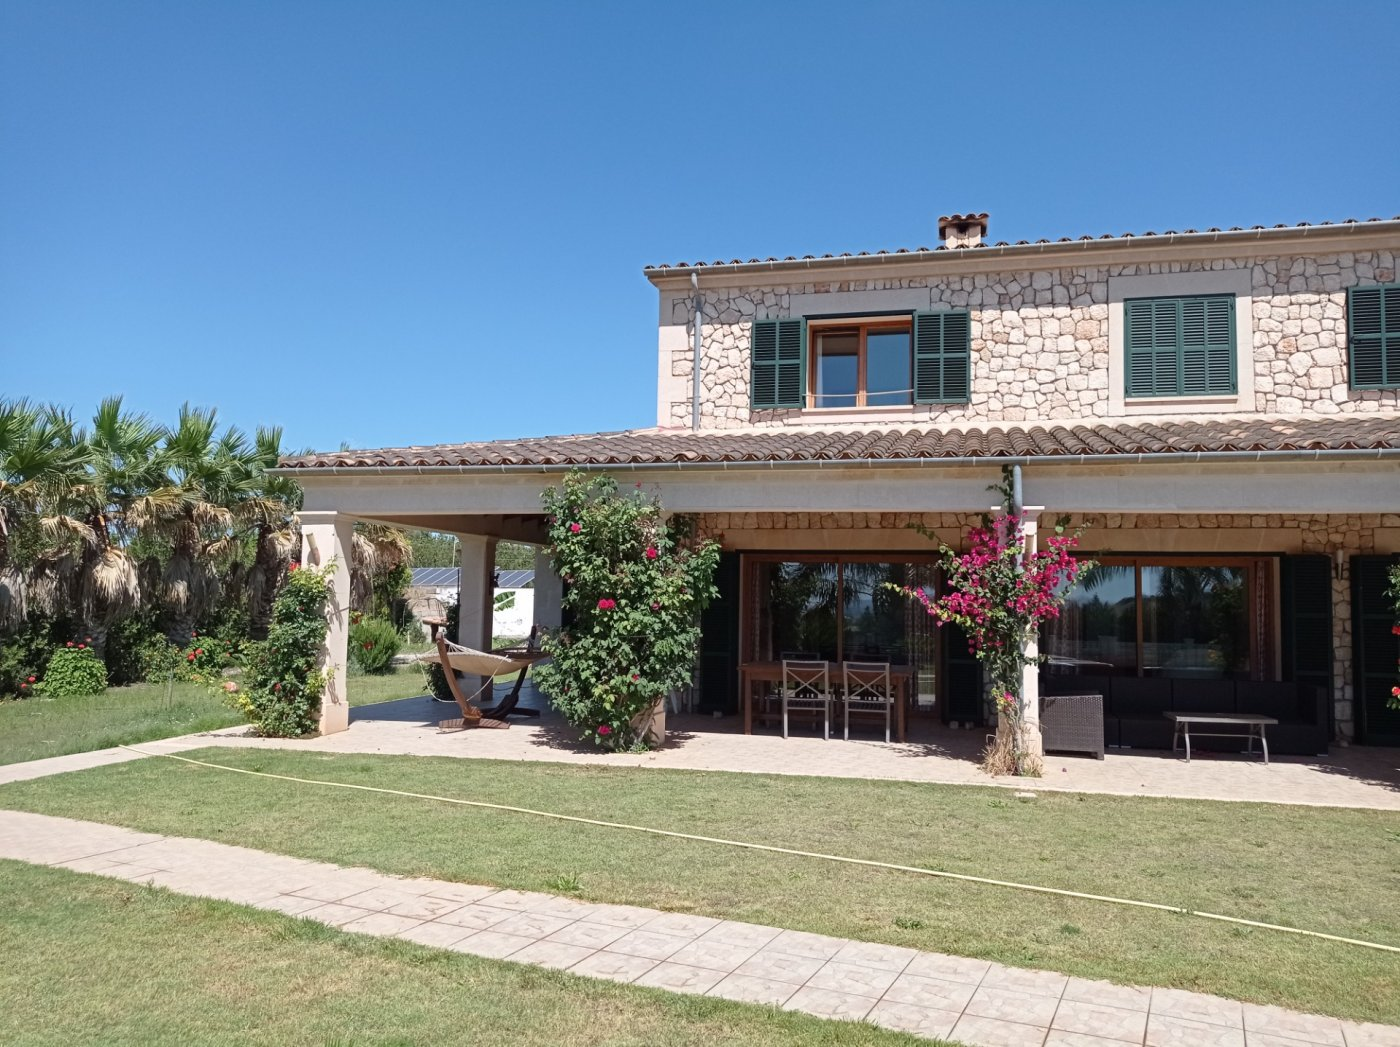 Finca es vinyet hotel boutique for sale in petra - imagenInmueble4